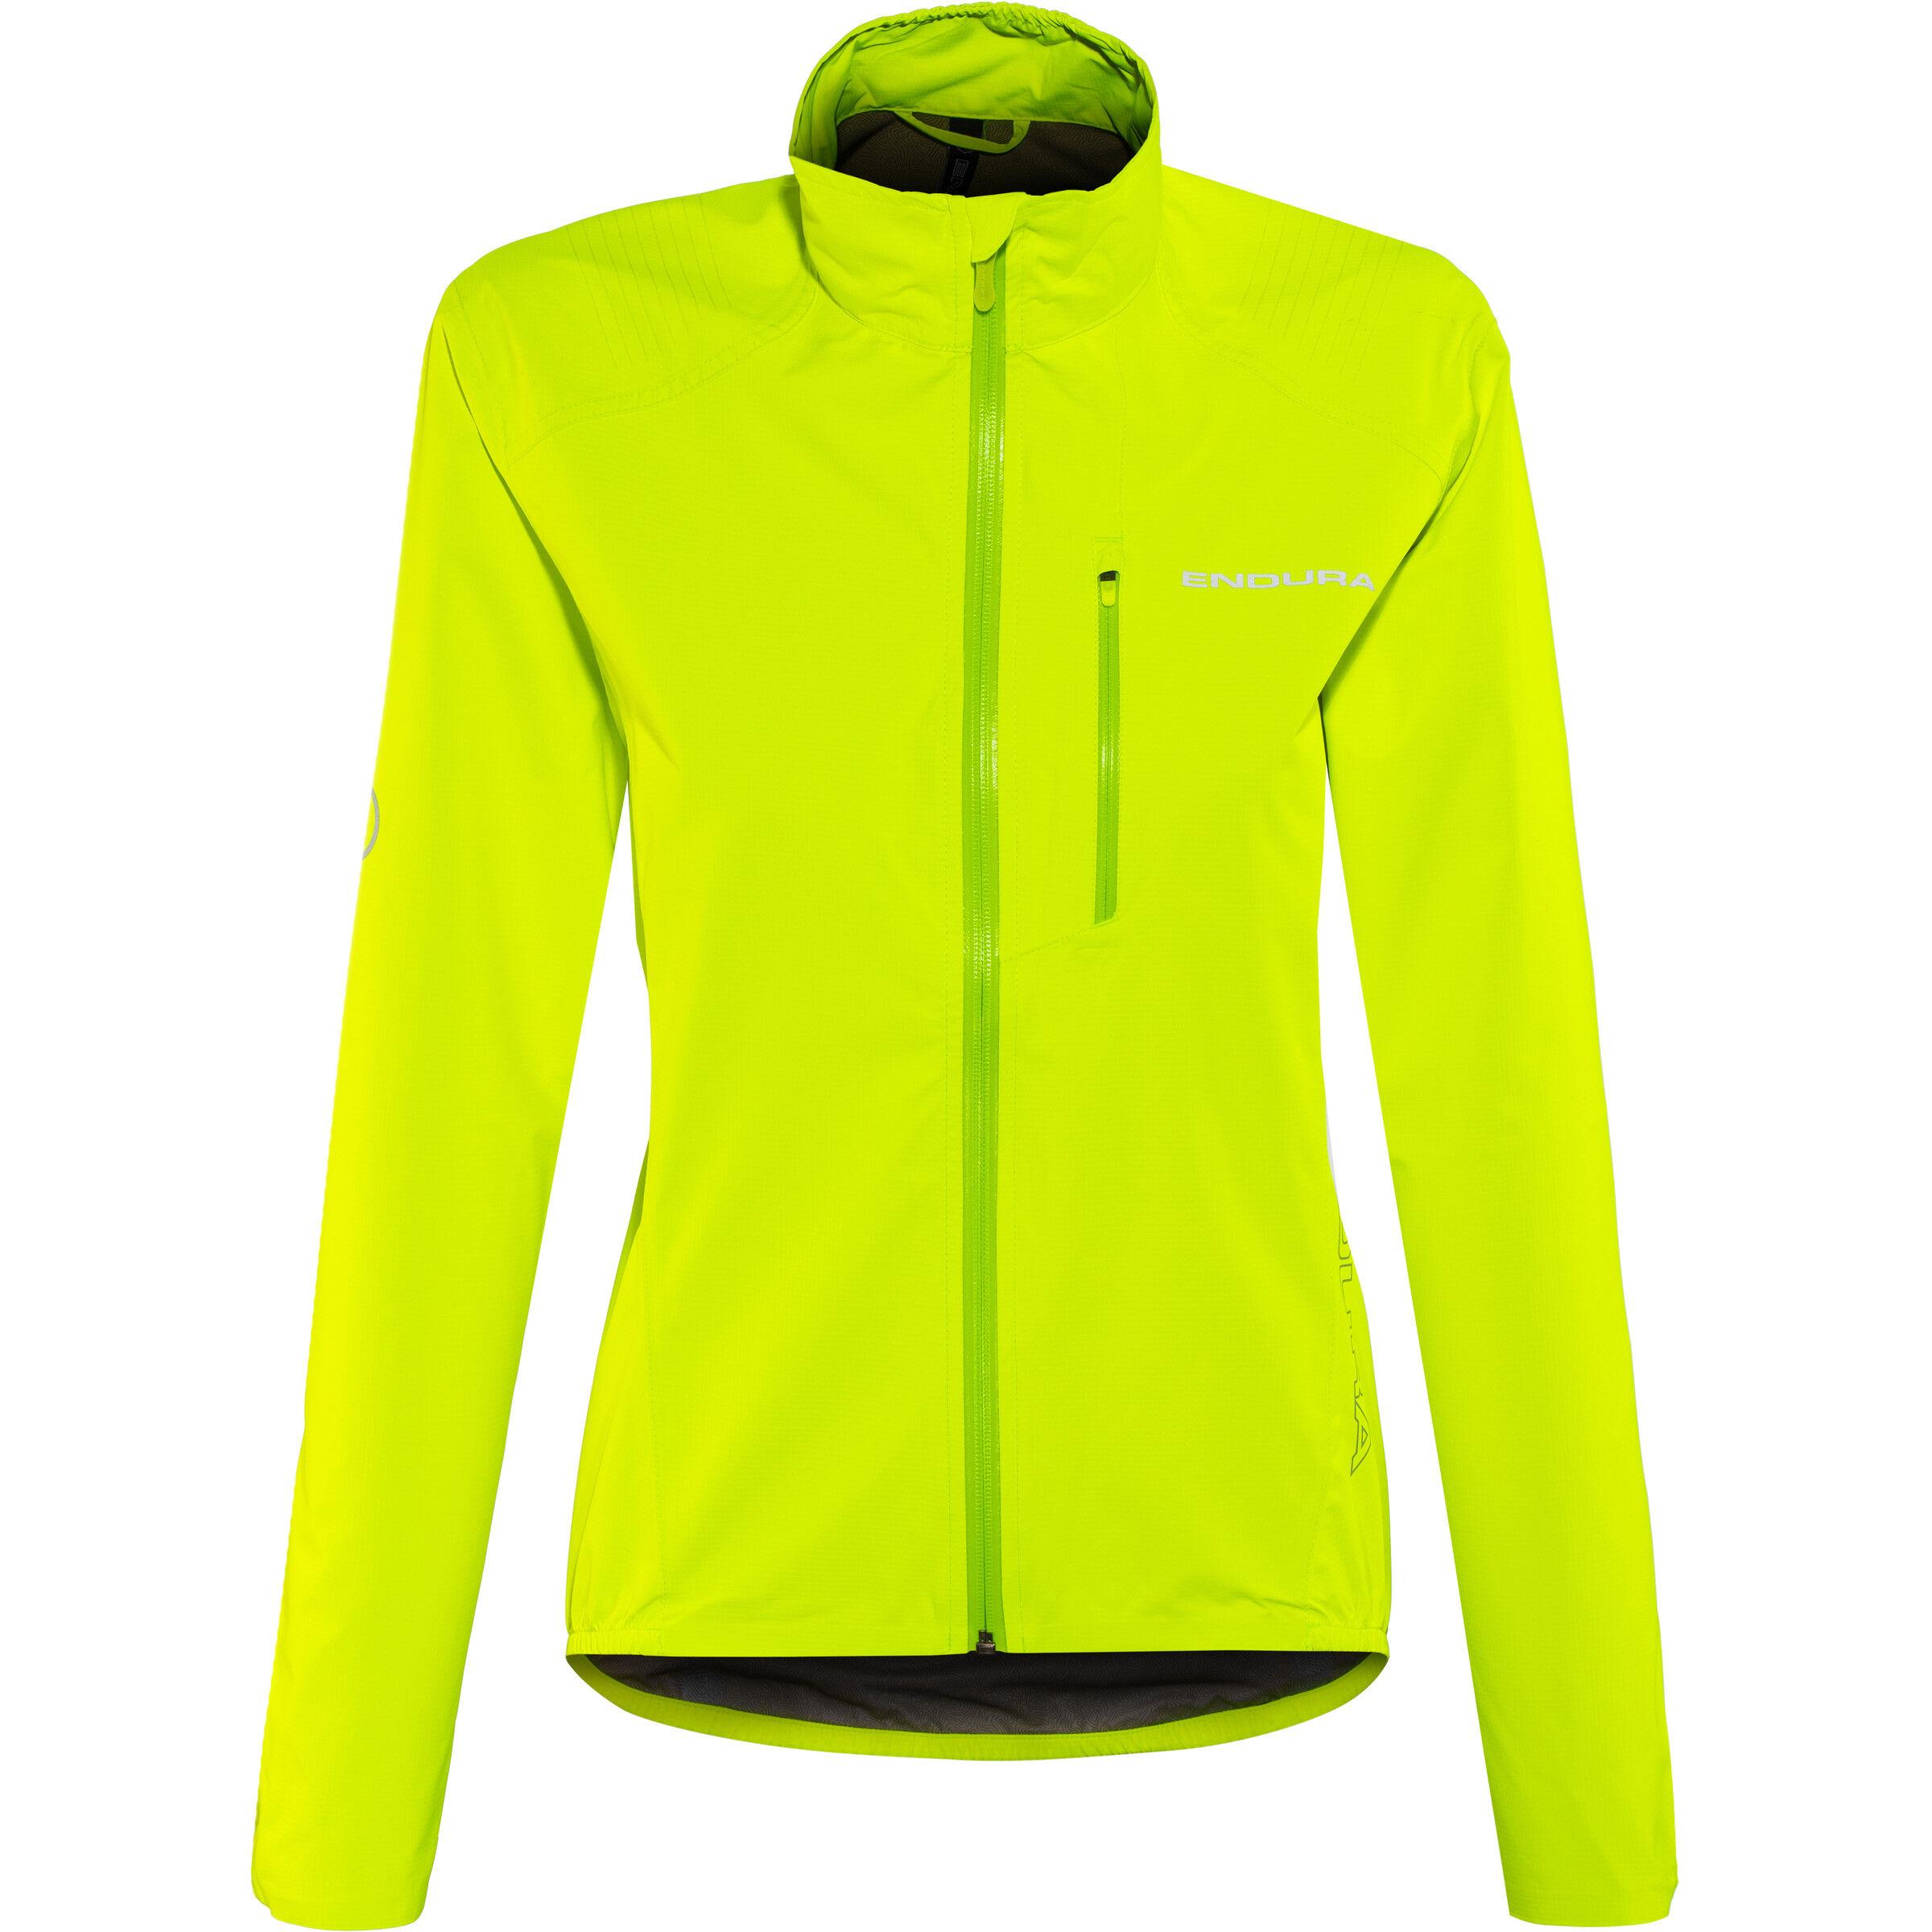 Lite Gelb Neon Jacke Hummvee Damen Endura 92IEHD